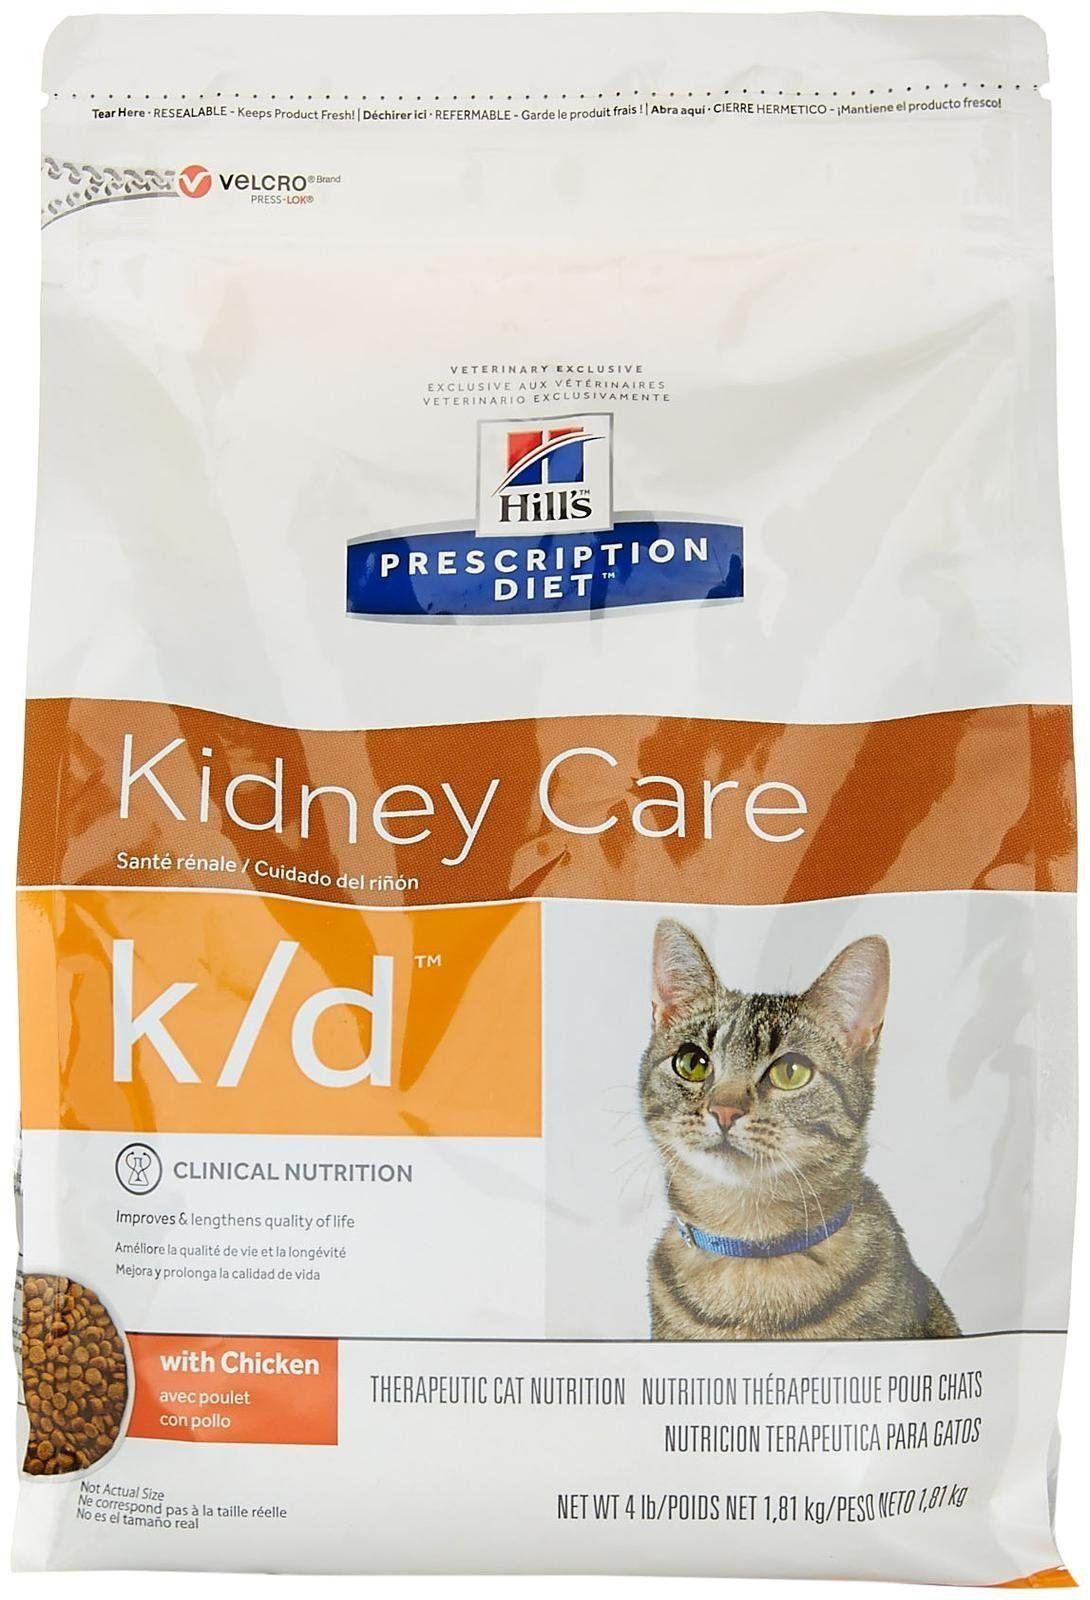 Hills prescription diet kd feline renal health dry food